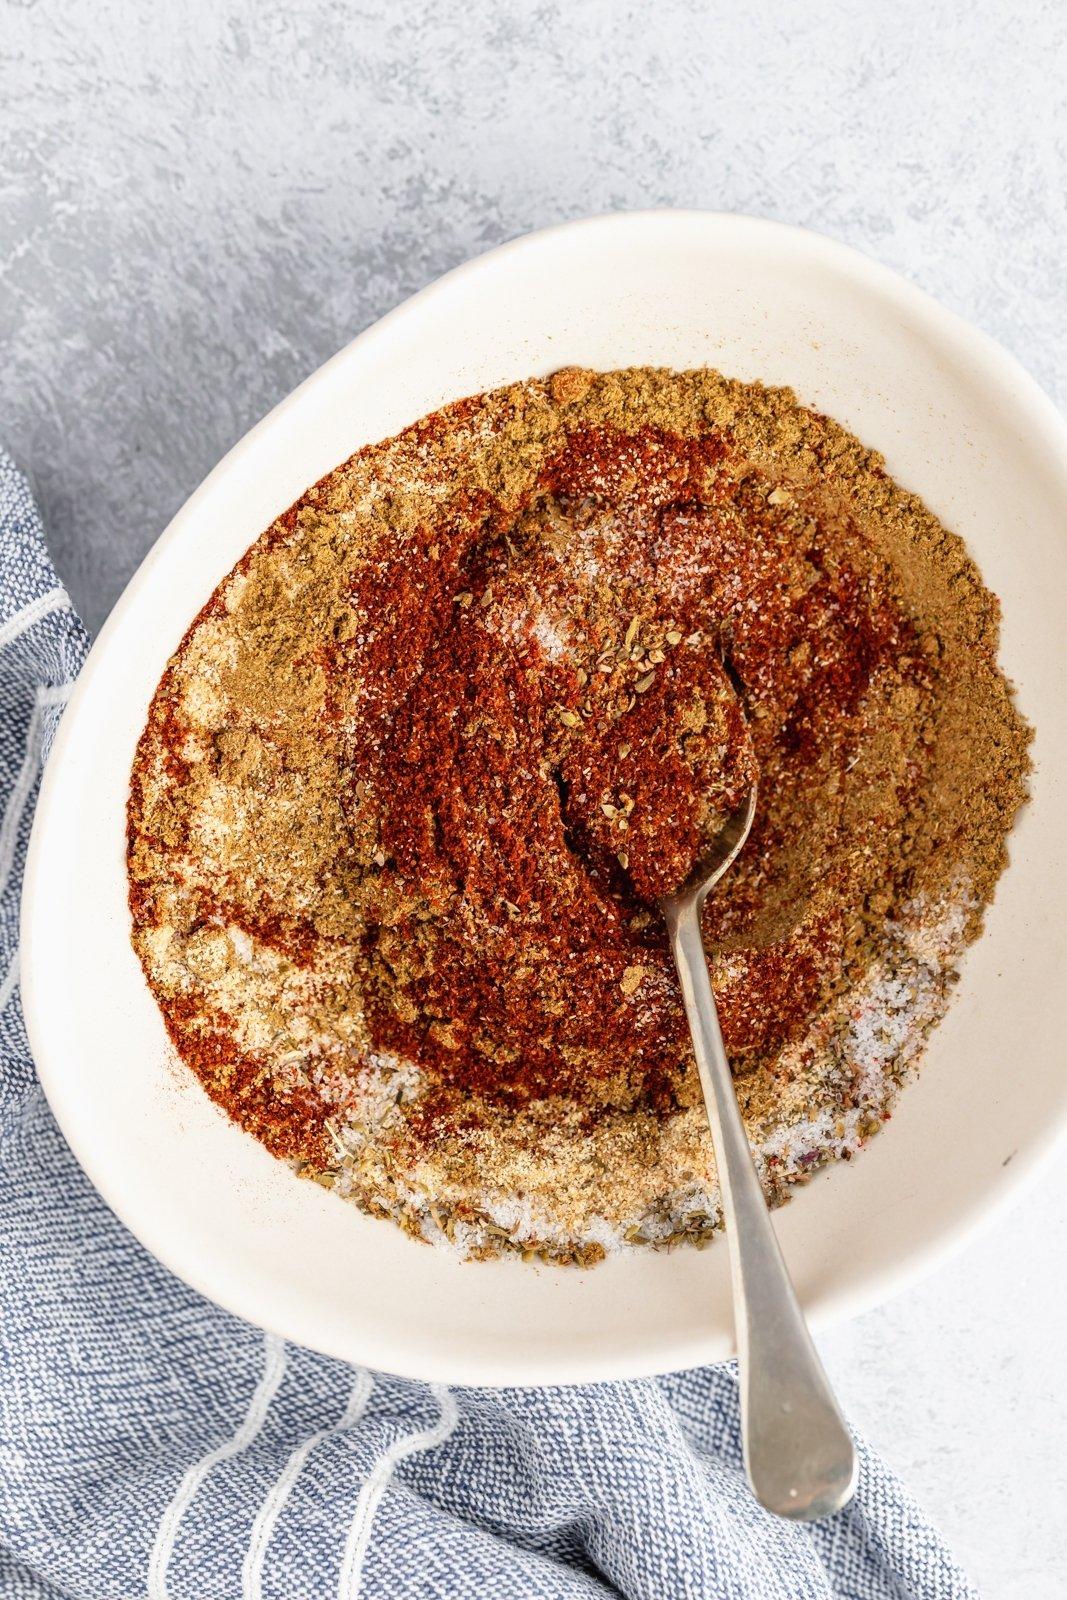 easy homemade taco seasoning mixed in a bowl